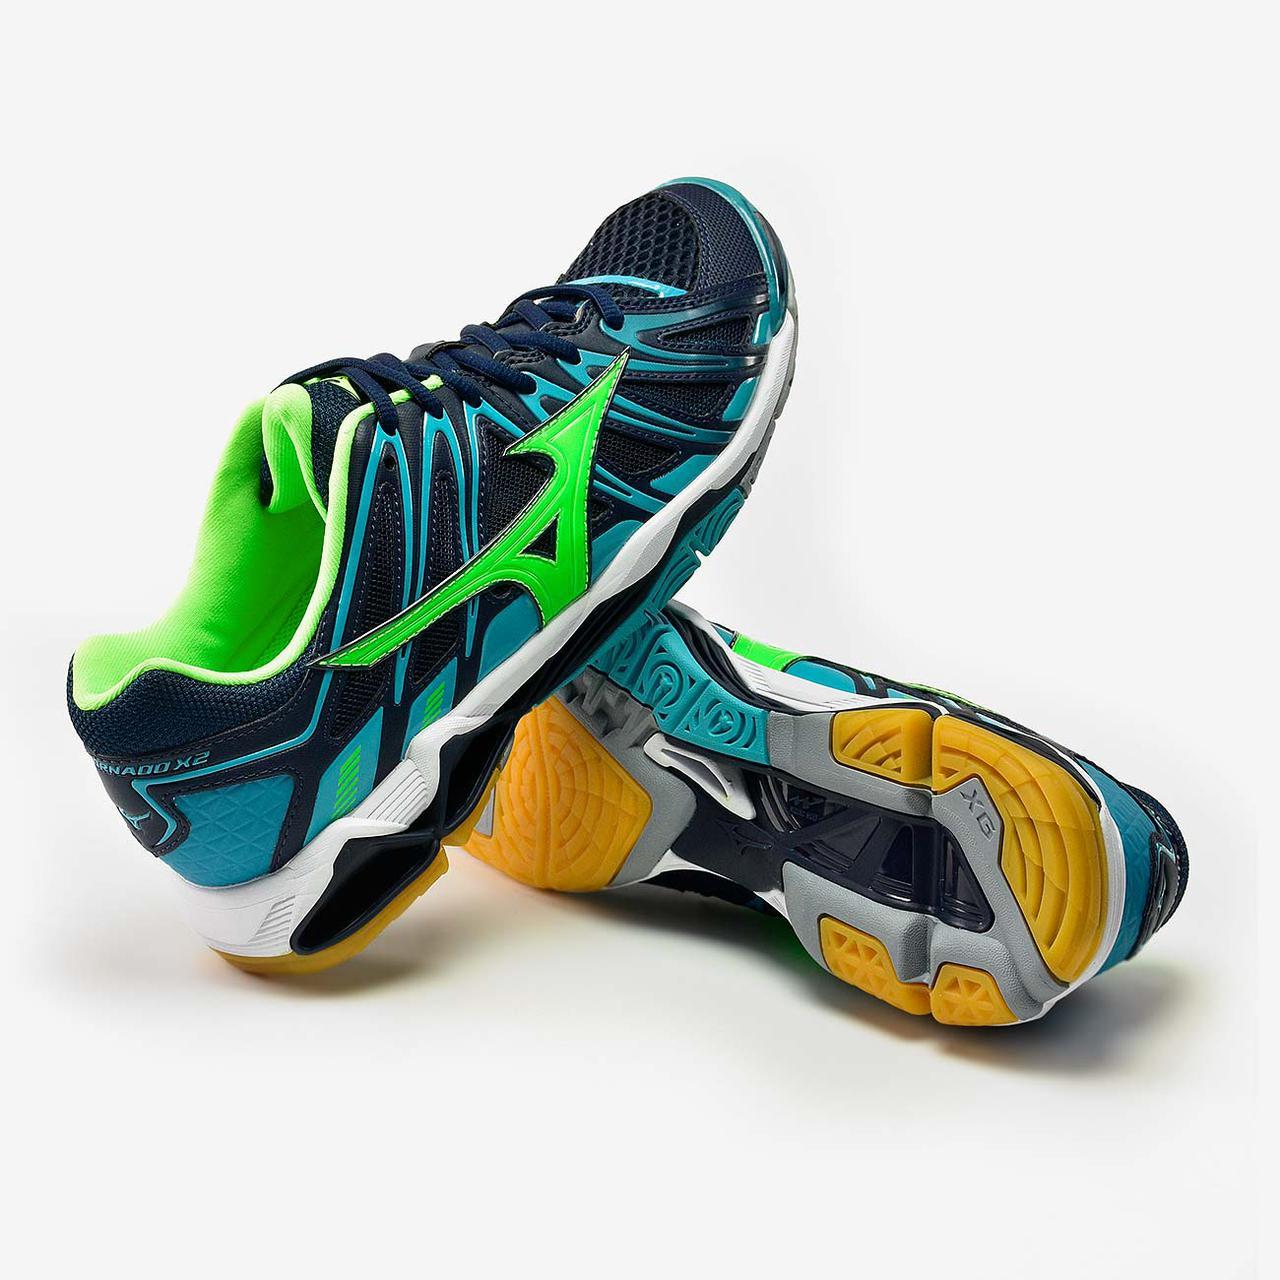 ... Кроссовки для волейбола Mizuno Wave Tornado X2 (V1GA1812-36), ... 50dd28d26bf